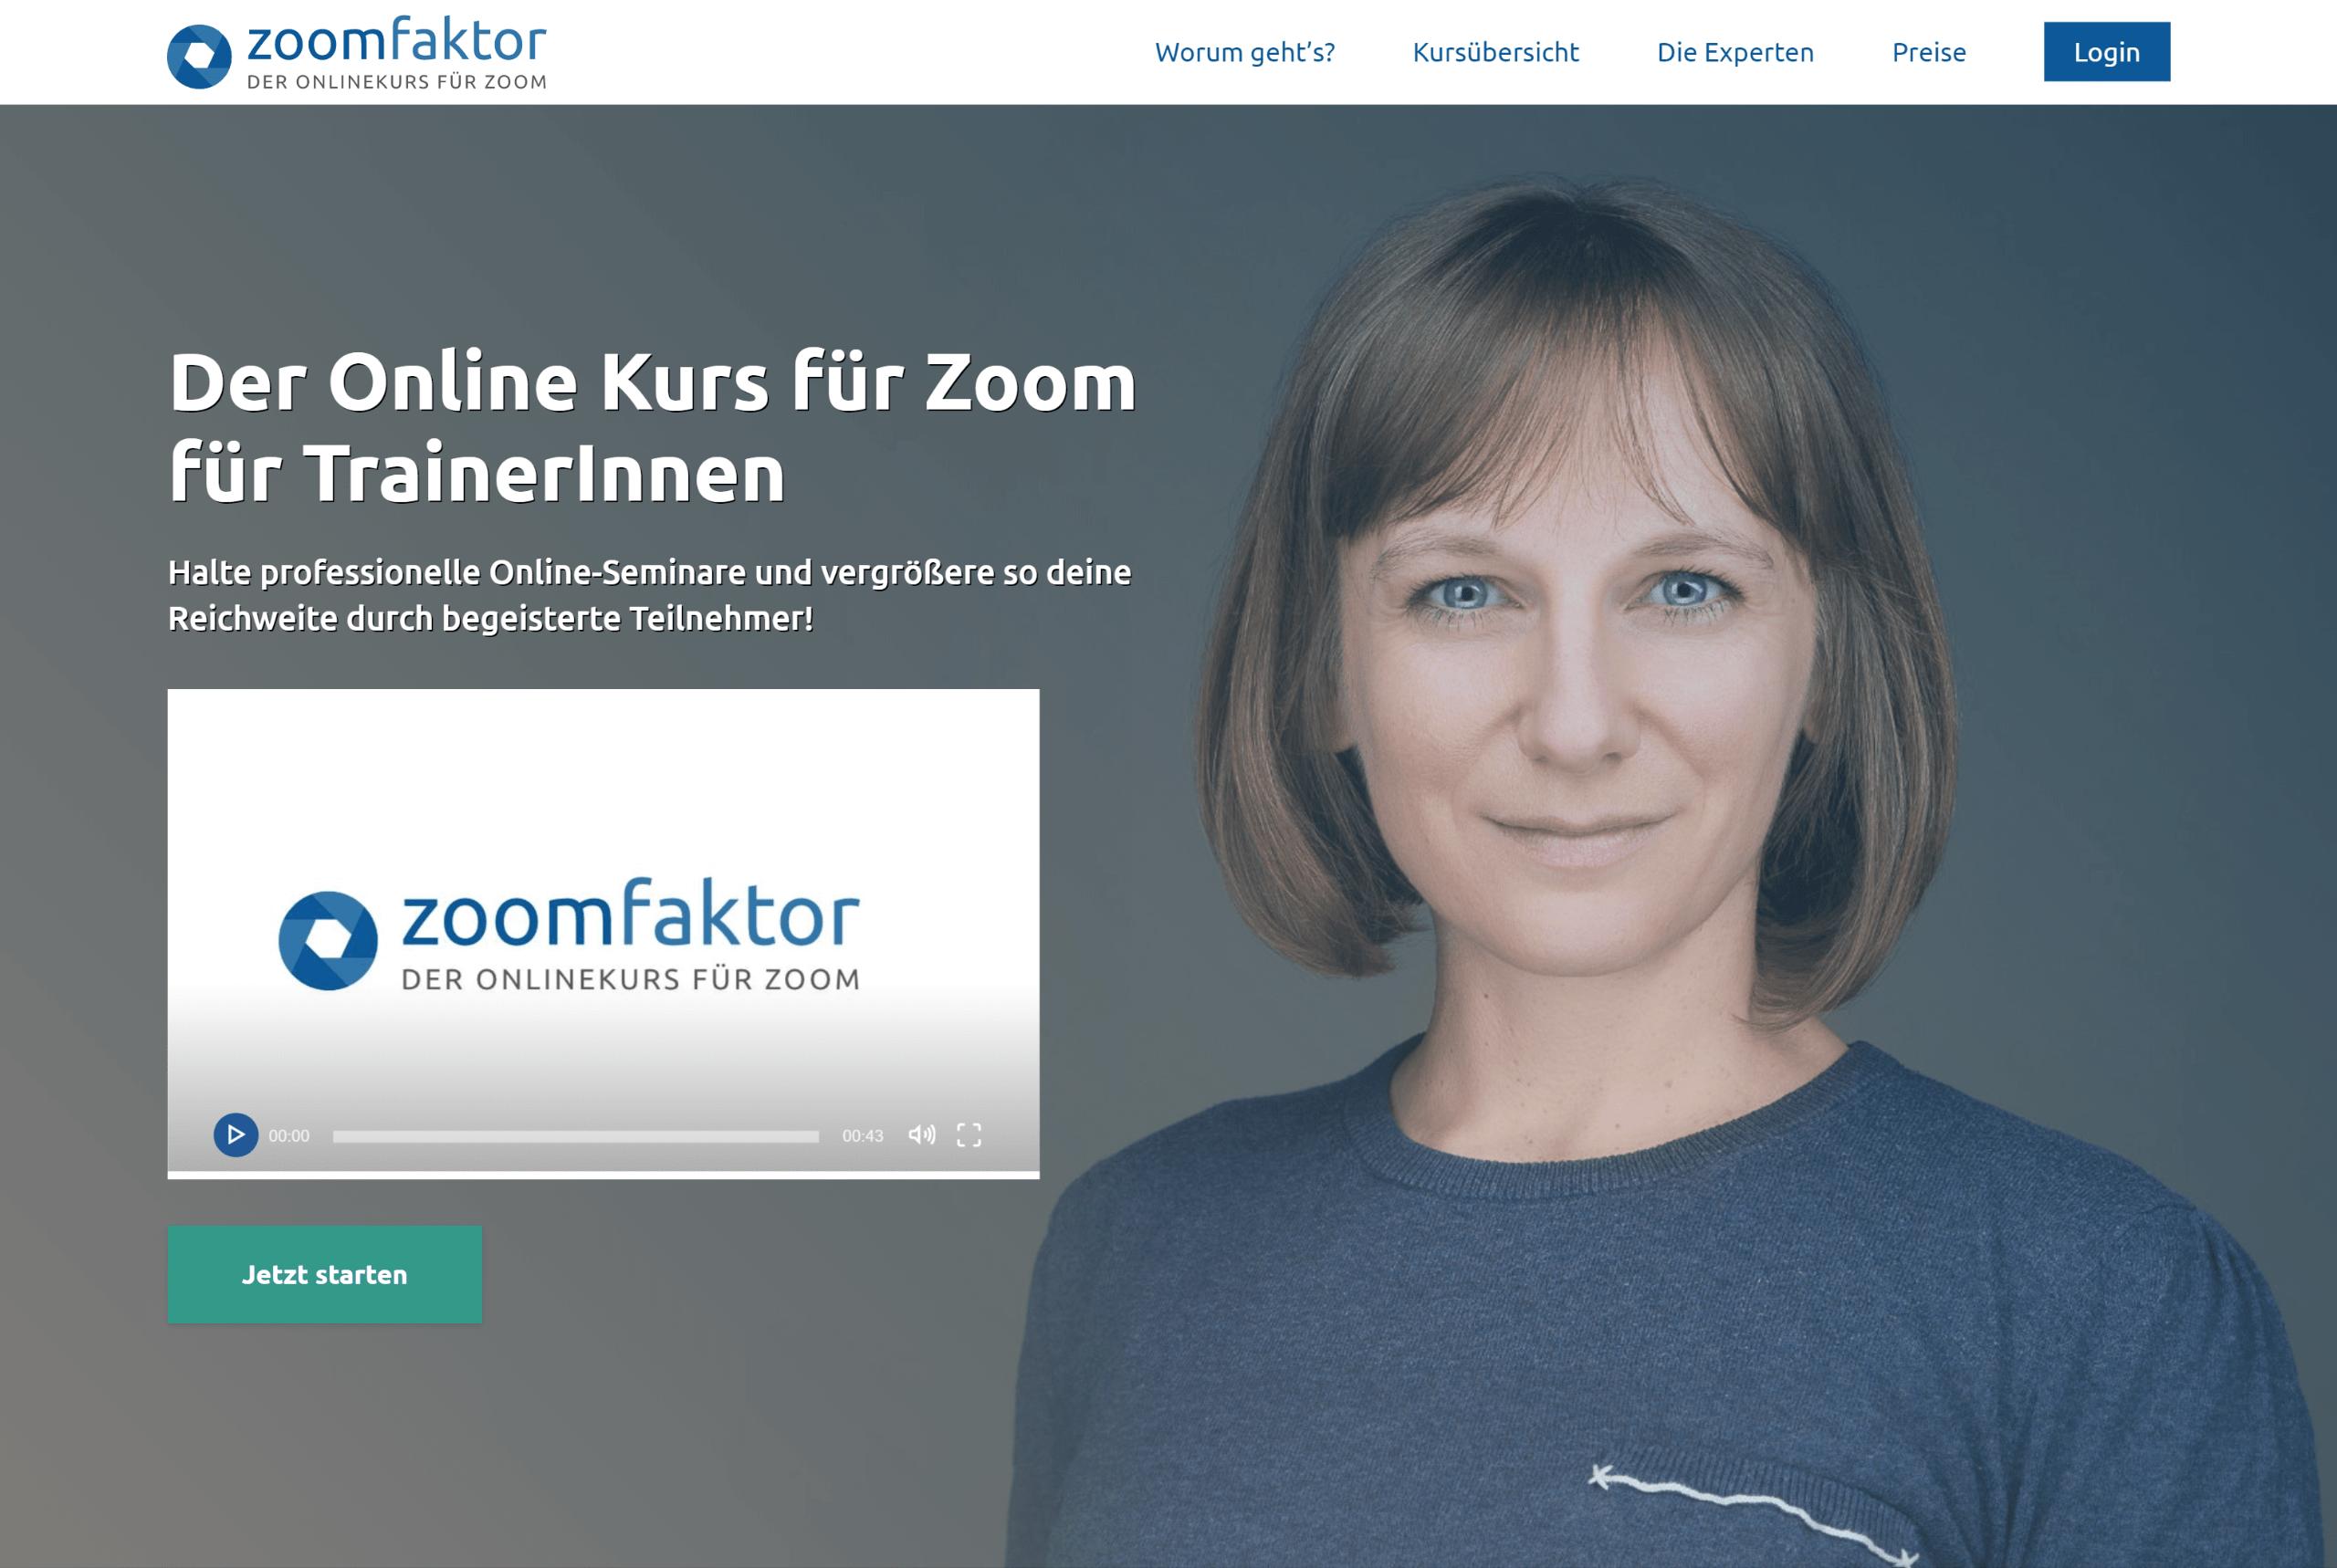 Zoomfaktorkurs Min